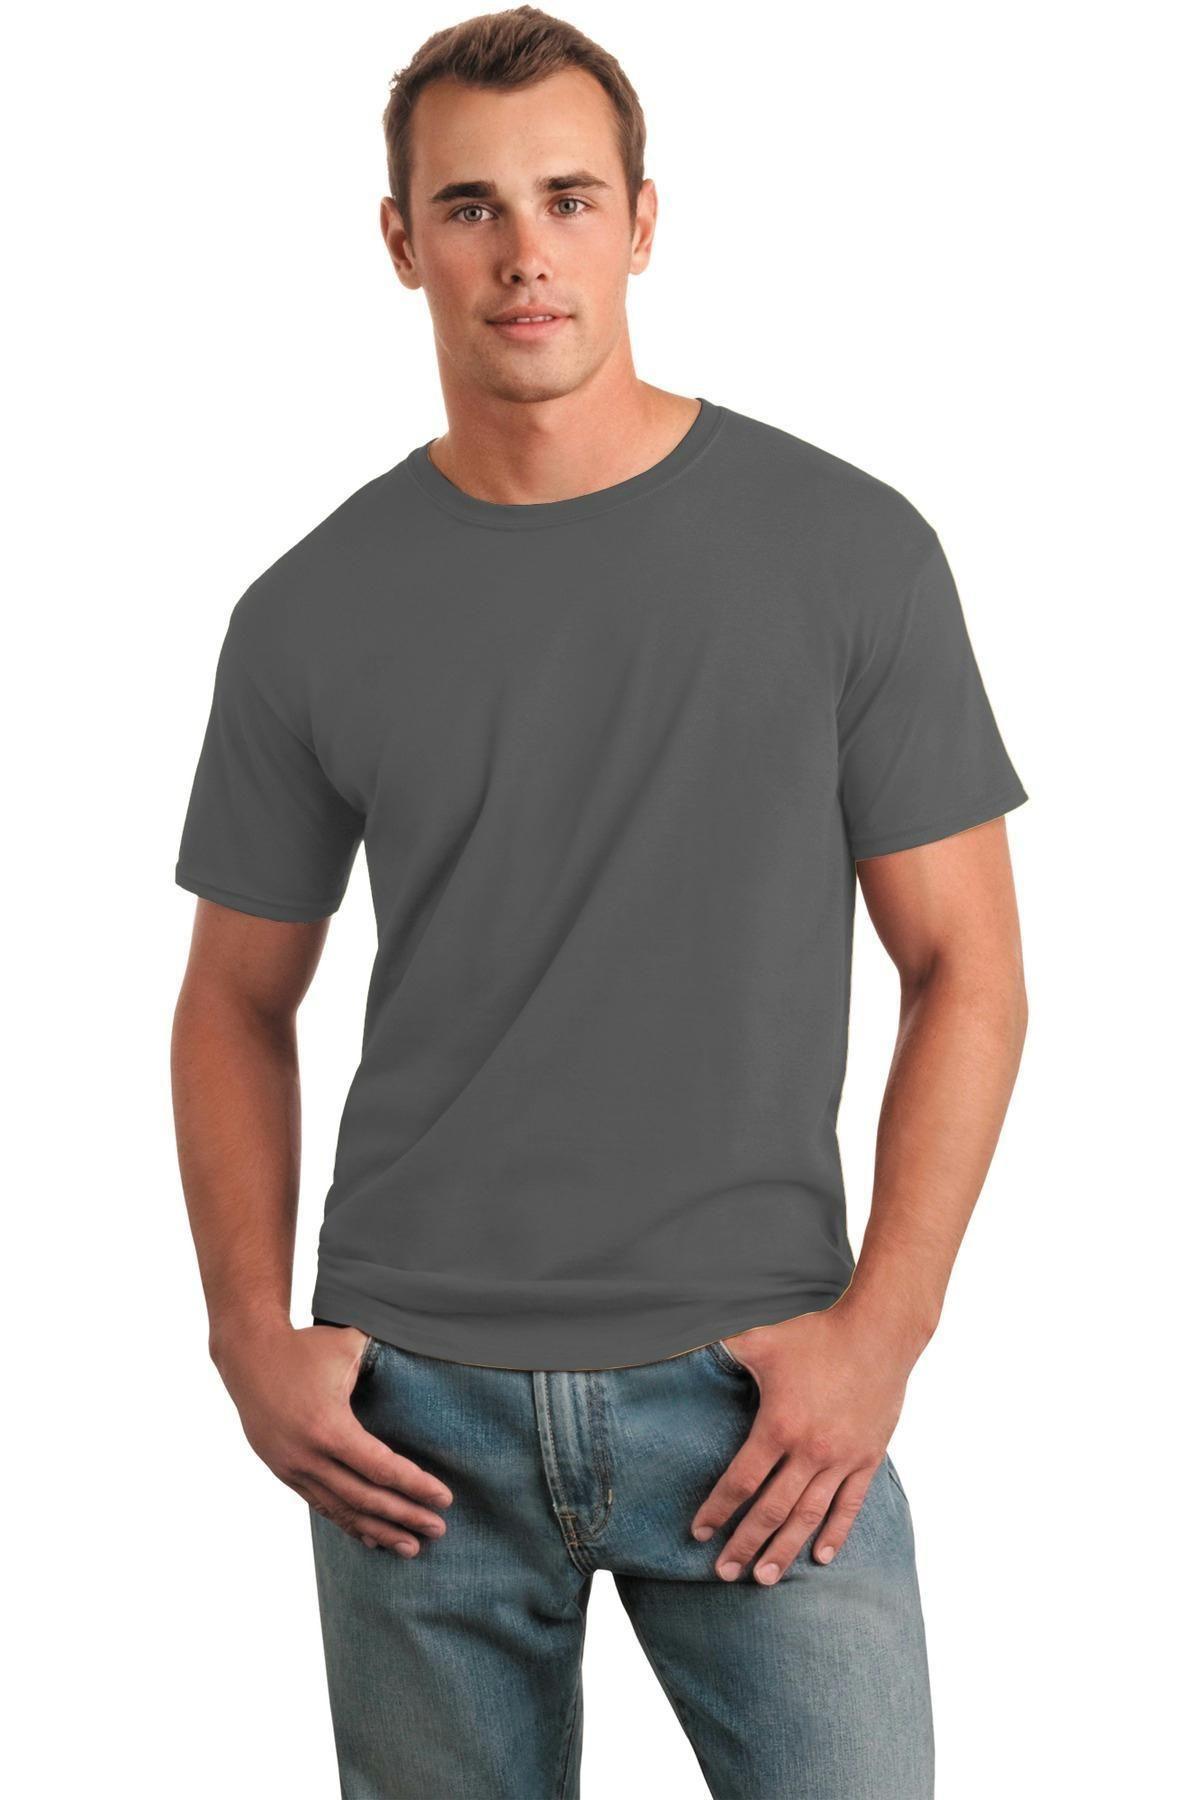 WHOLESALE Men/'s Blank T Shirt Plain Work Men/'s Gildan Tee Red